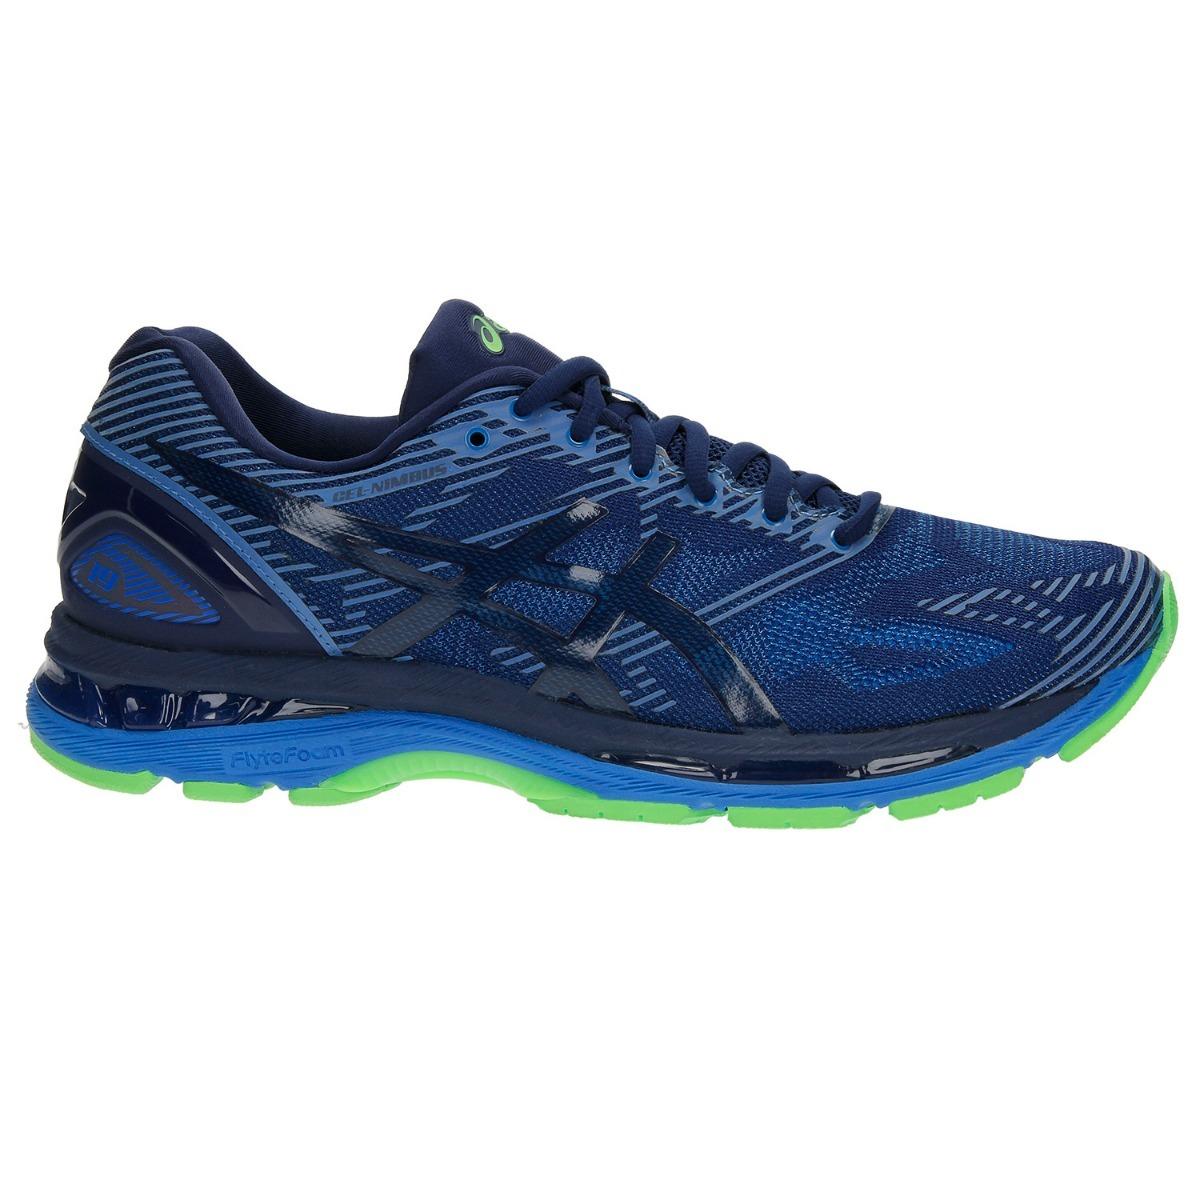 Tenis Asics Hombre Azul Gel Nimbus 19 Lite Show T7c3n4943